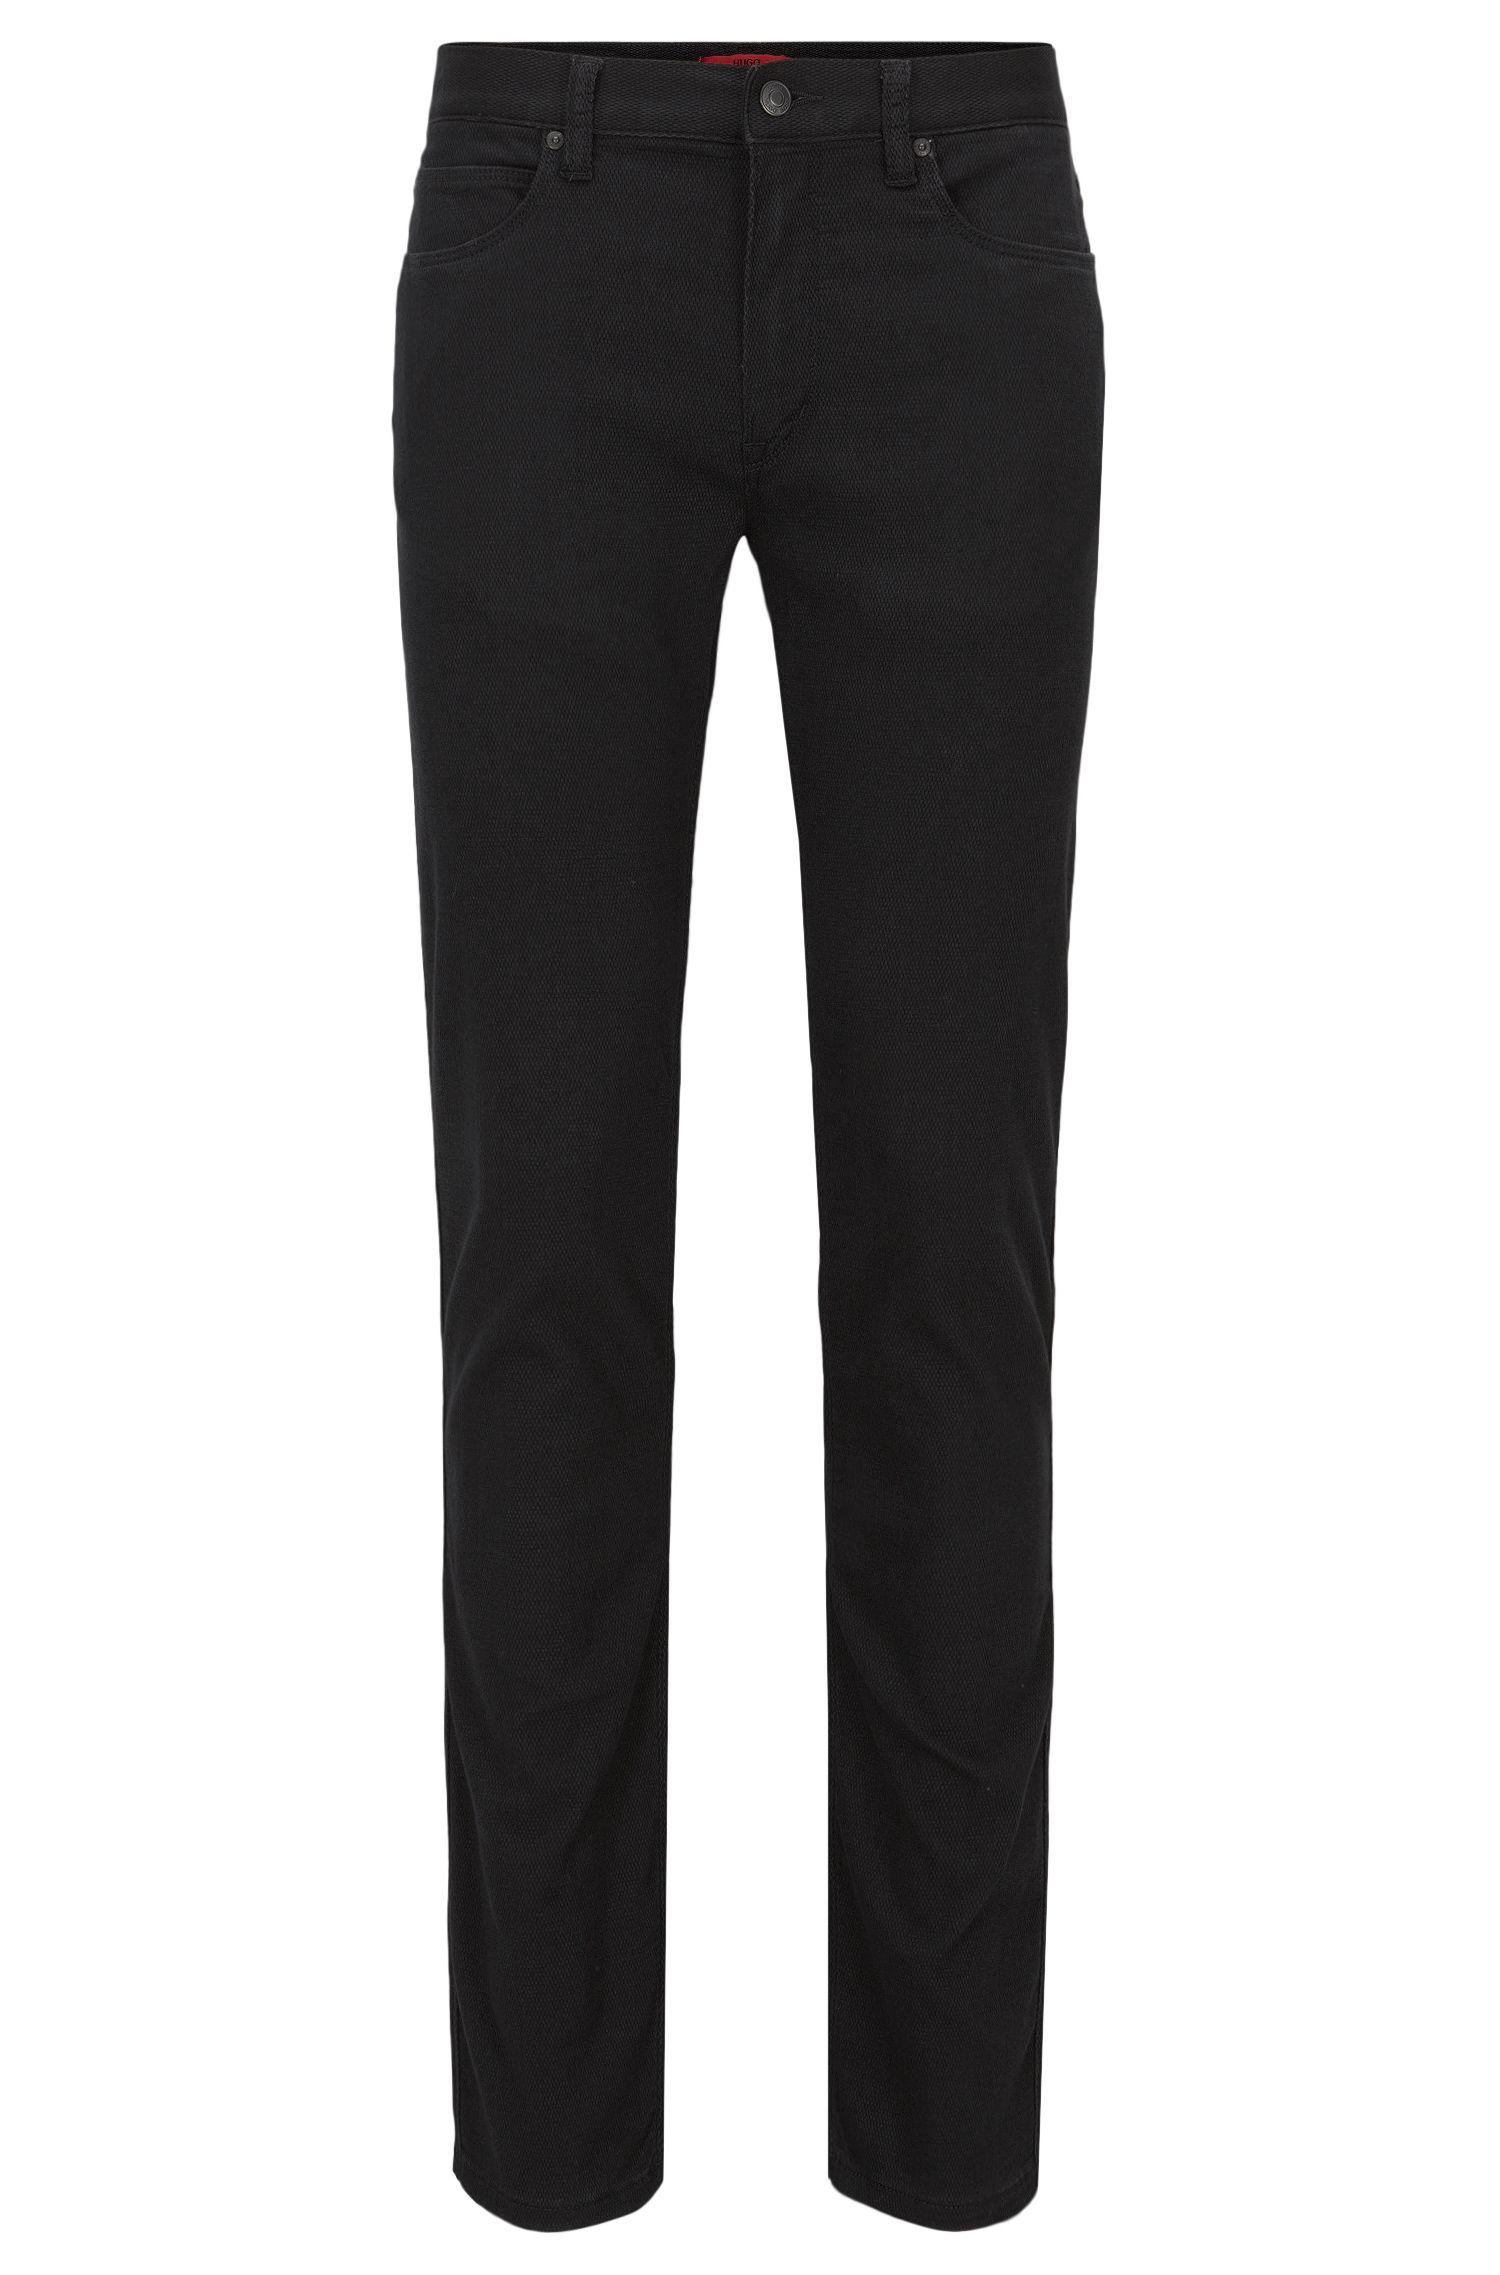 'HUGO 708' | Slim Fit, Stretch Cotton Jeans